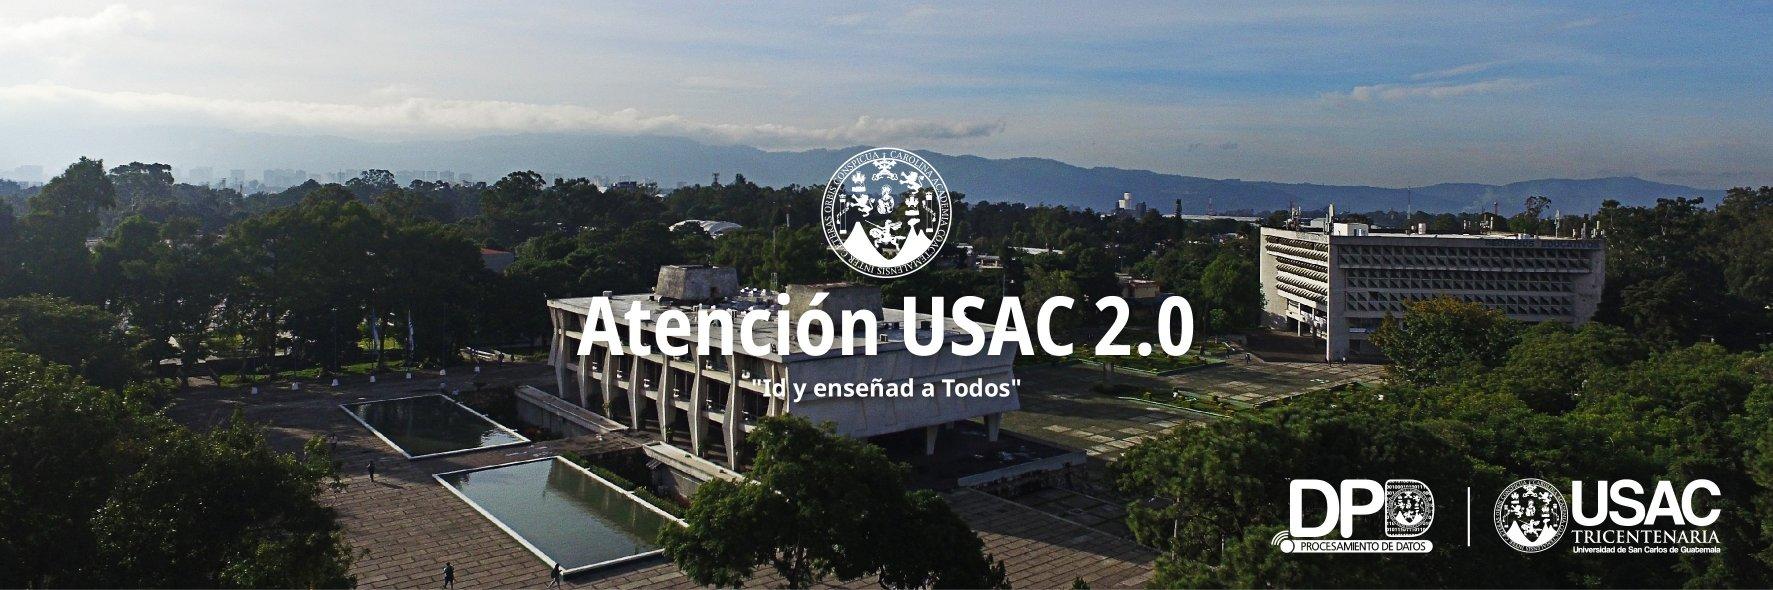 Universidad de San Carlos de Guatemala's official Twitter account